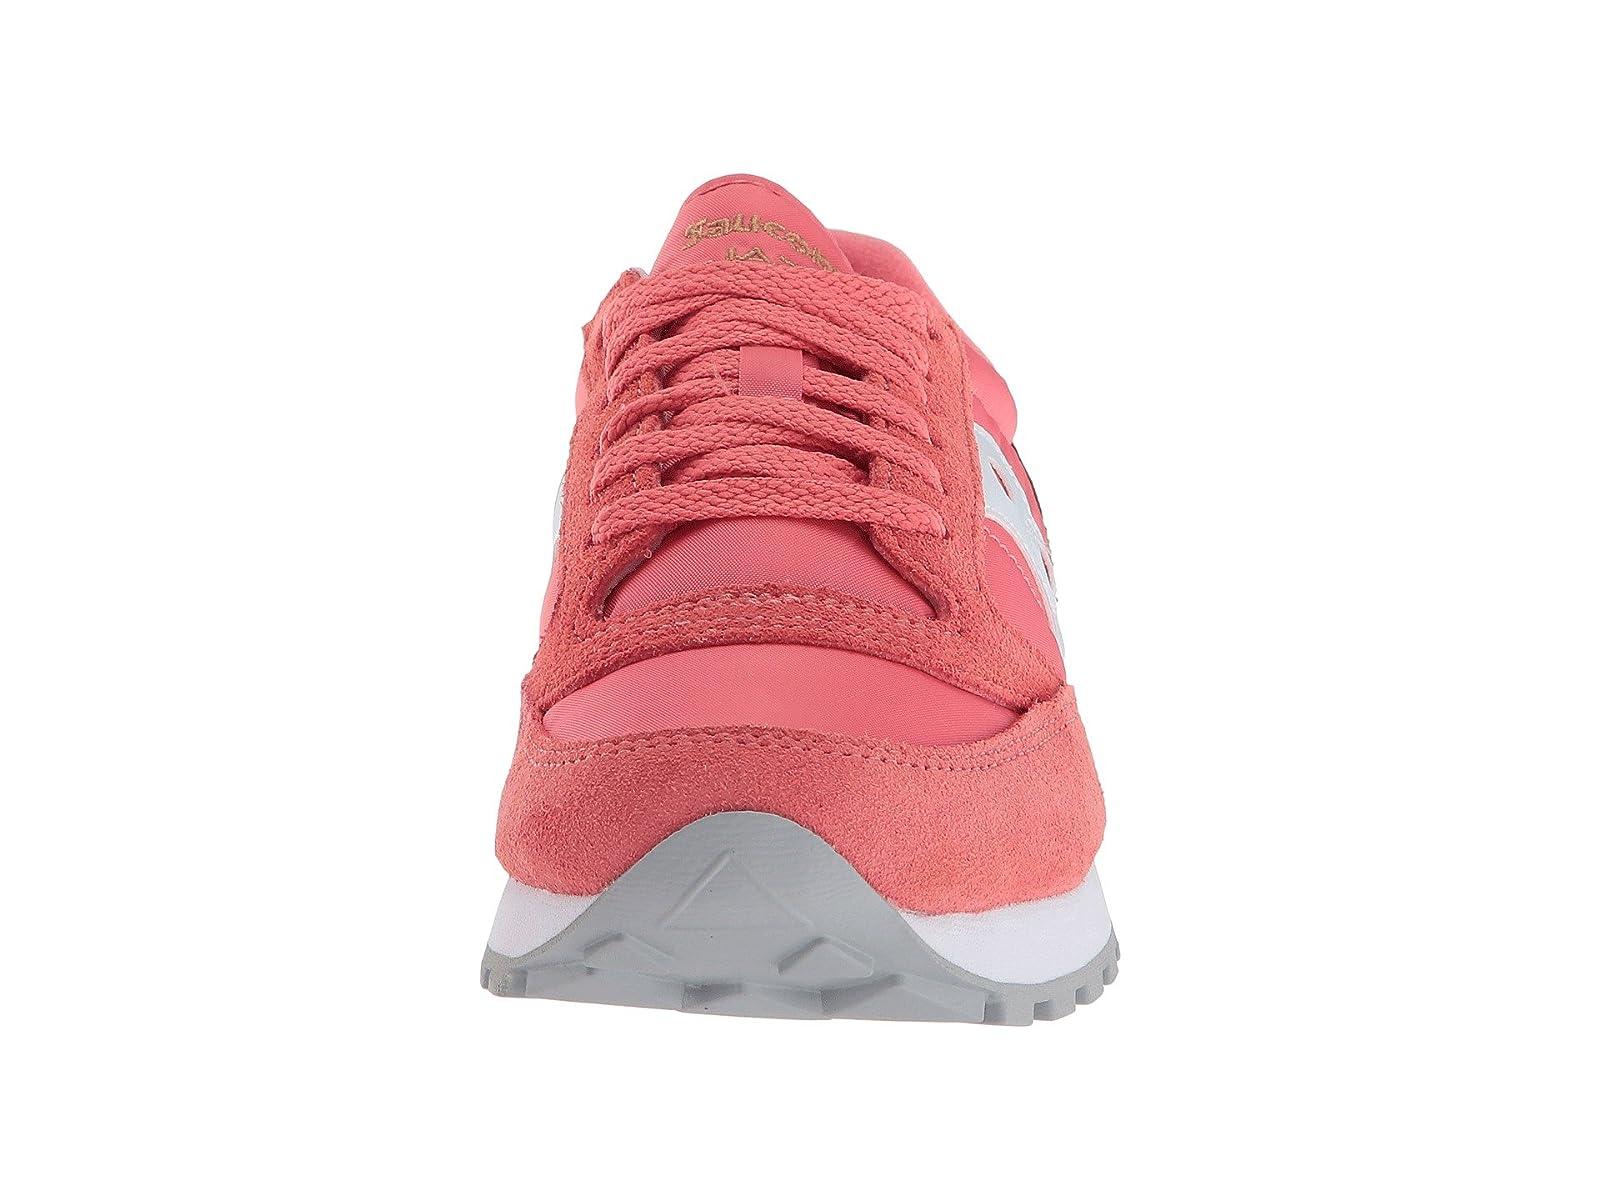 Woman-039-s-Sneakers-amp-Athletic-Shoes-Saucony-Originals-Jazz-Original thumbnail 29